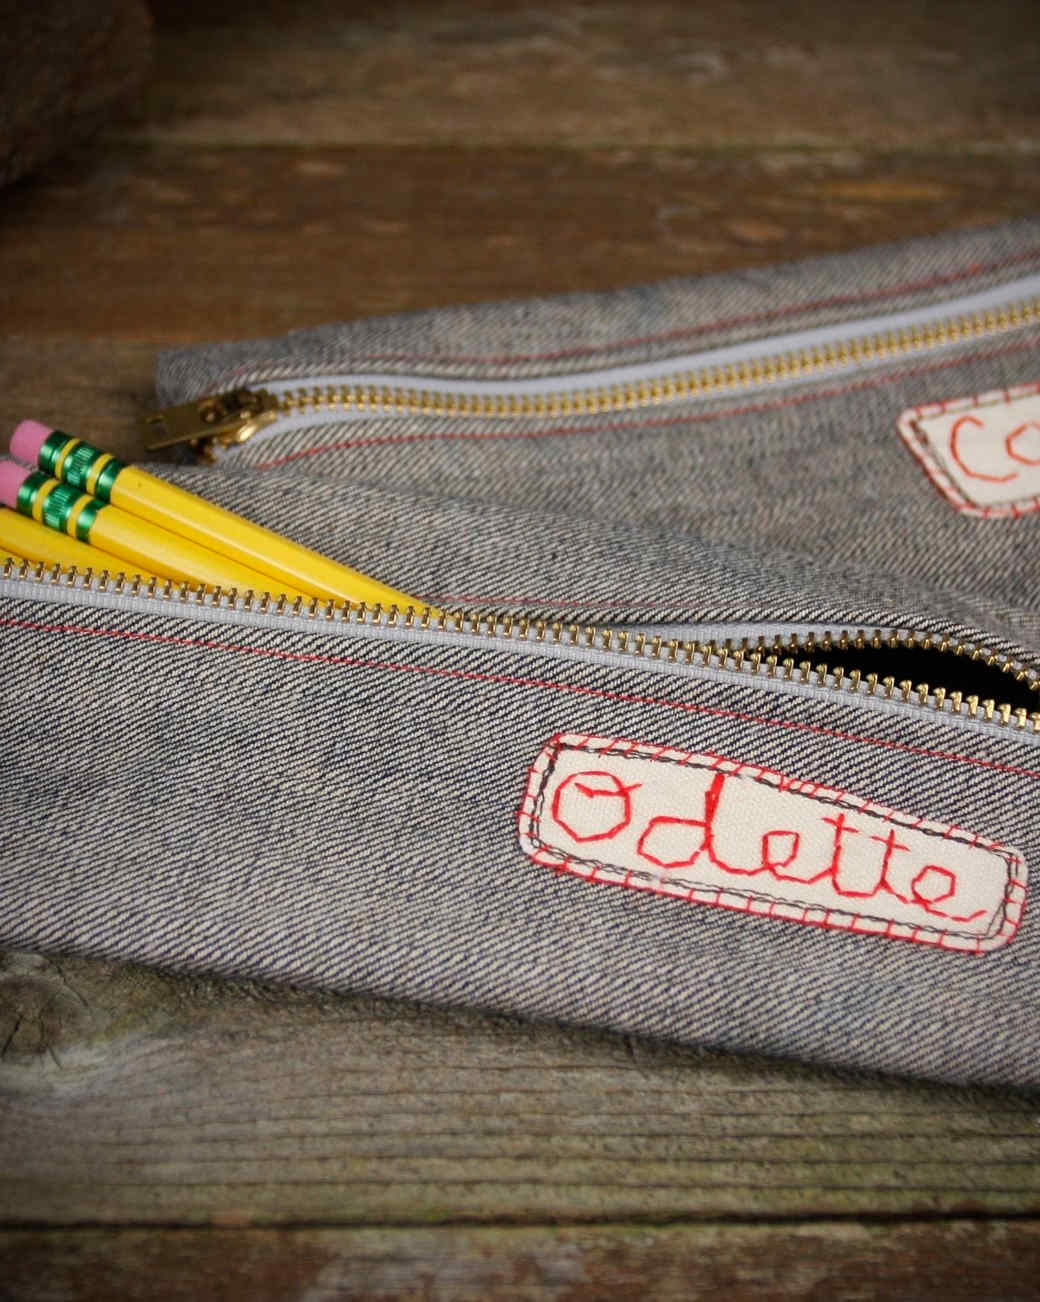 kata-golda-personalized-denim-zipper-pencil-case-0914.jpg